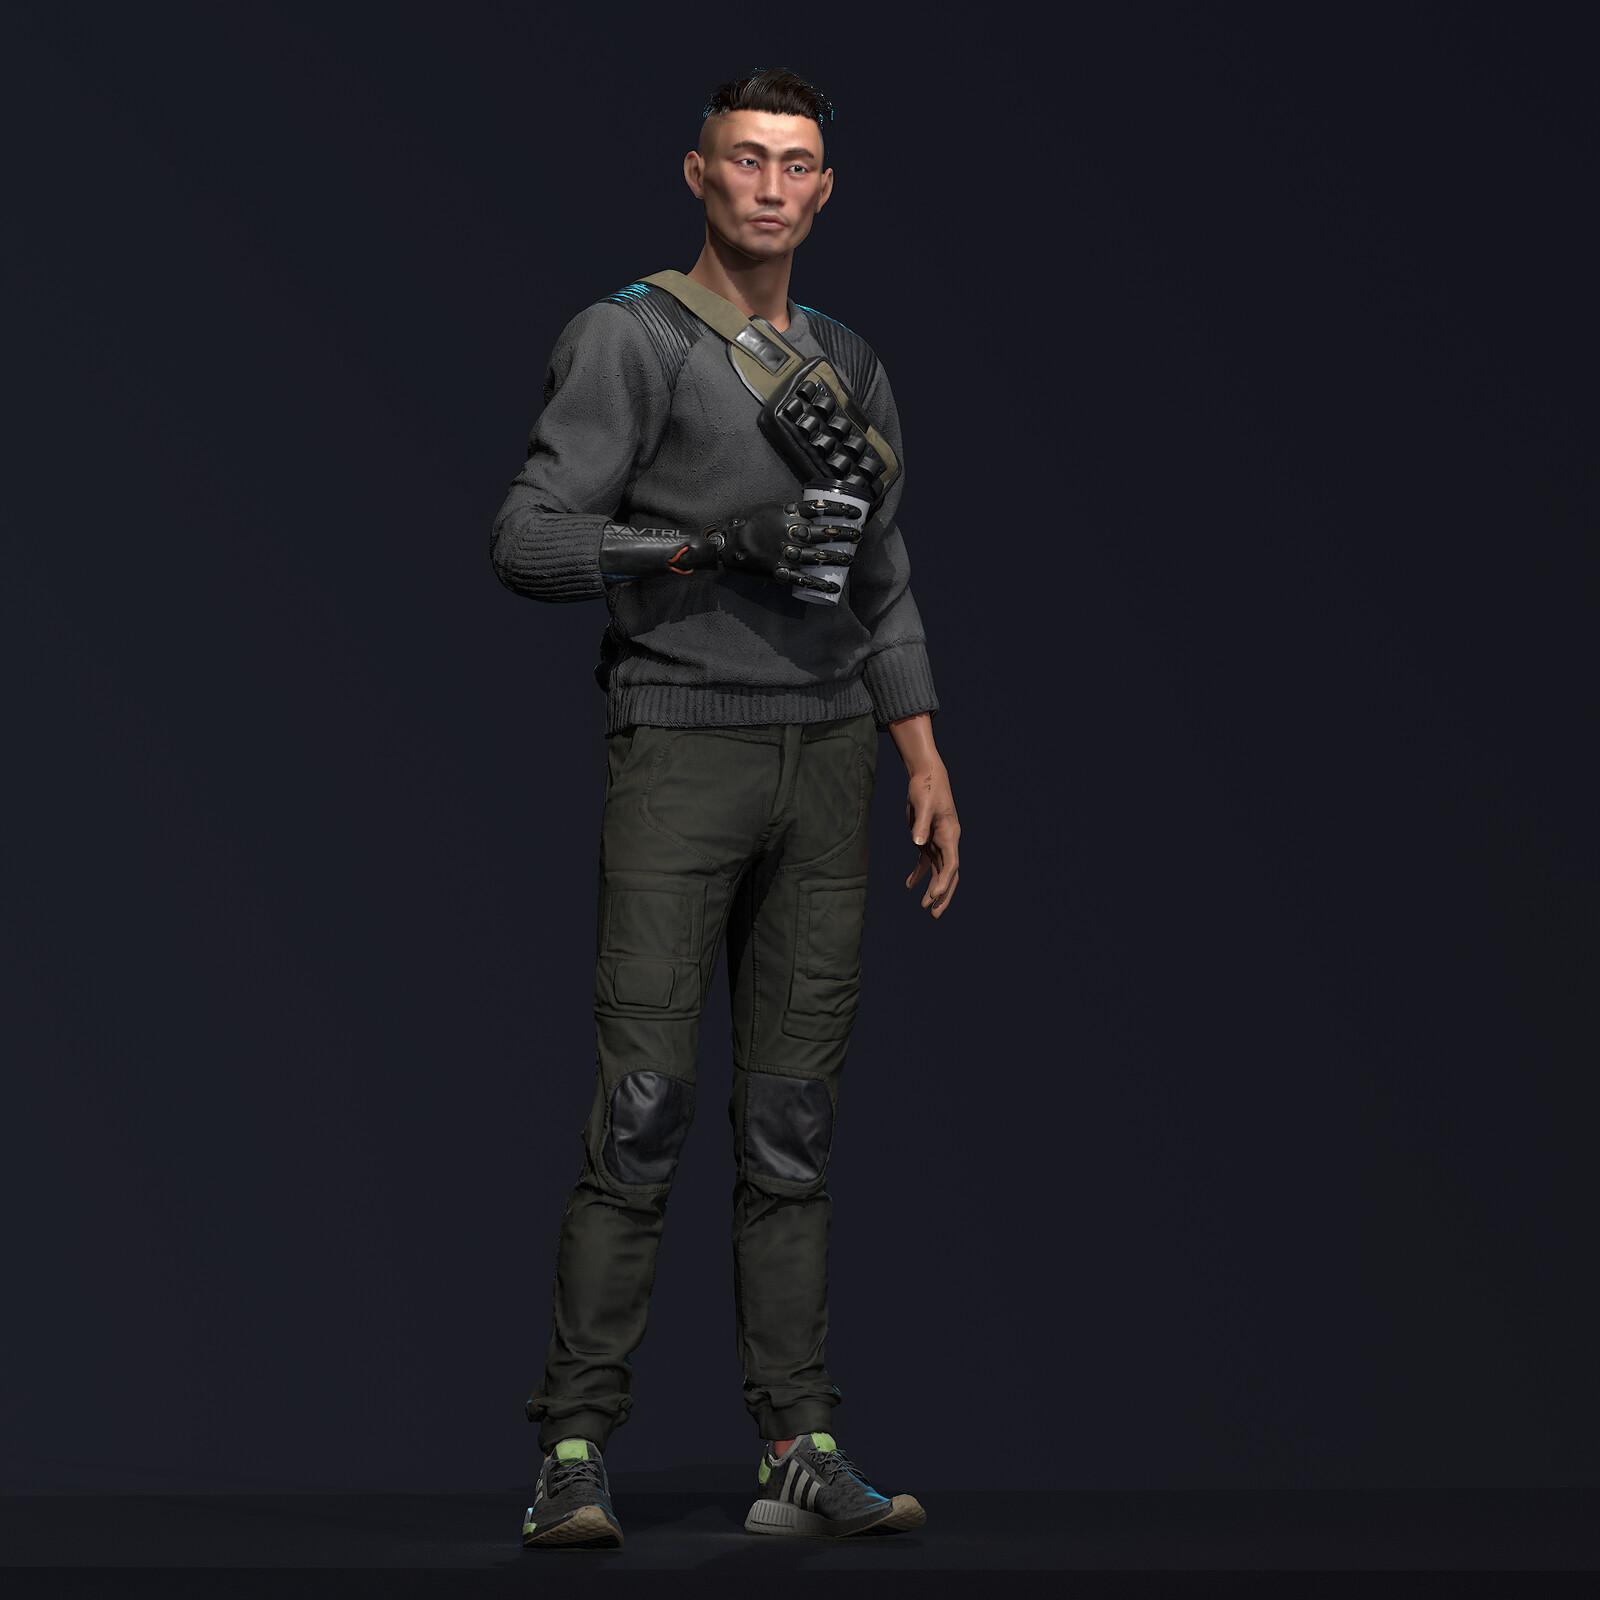 Cyberpunk Dude